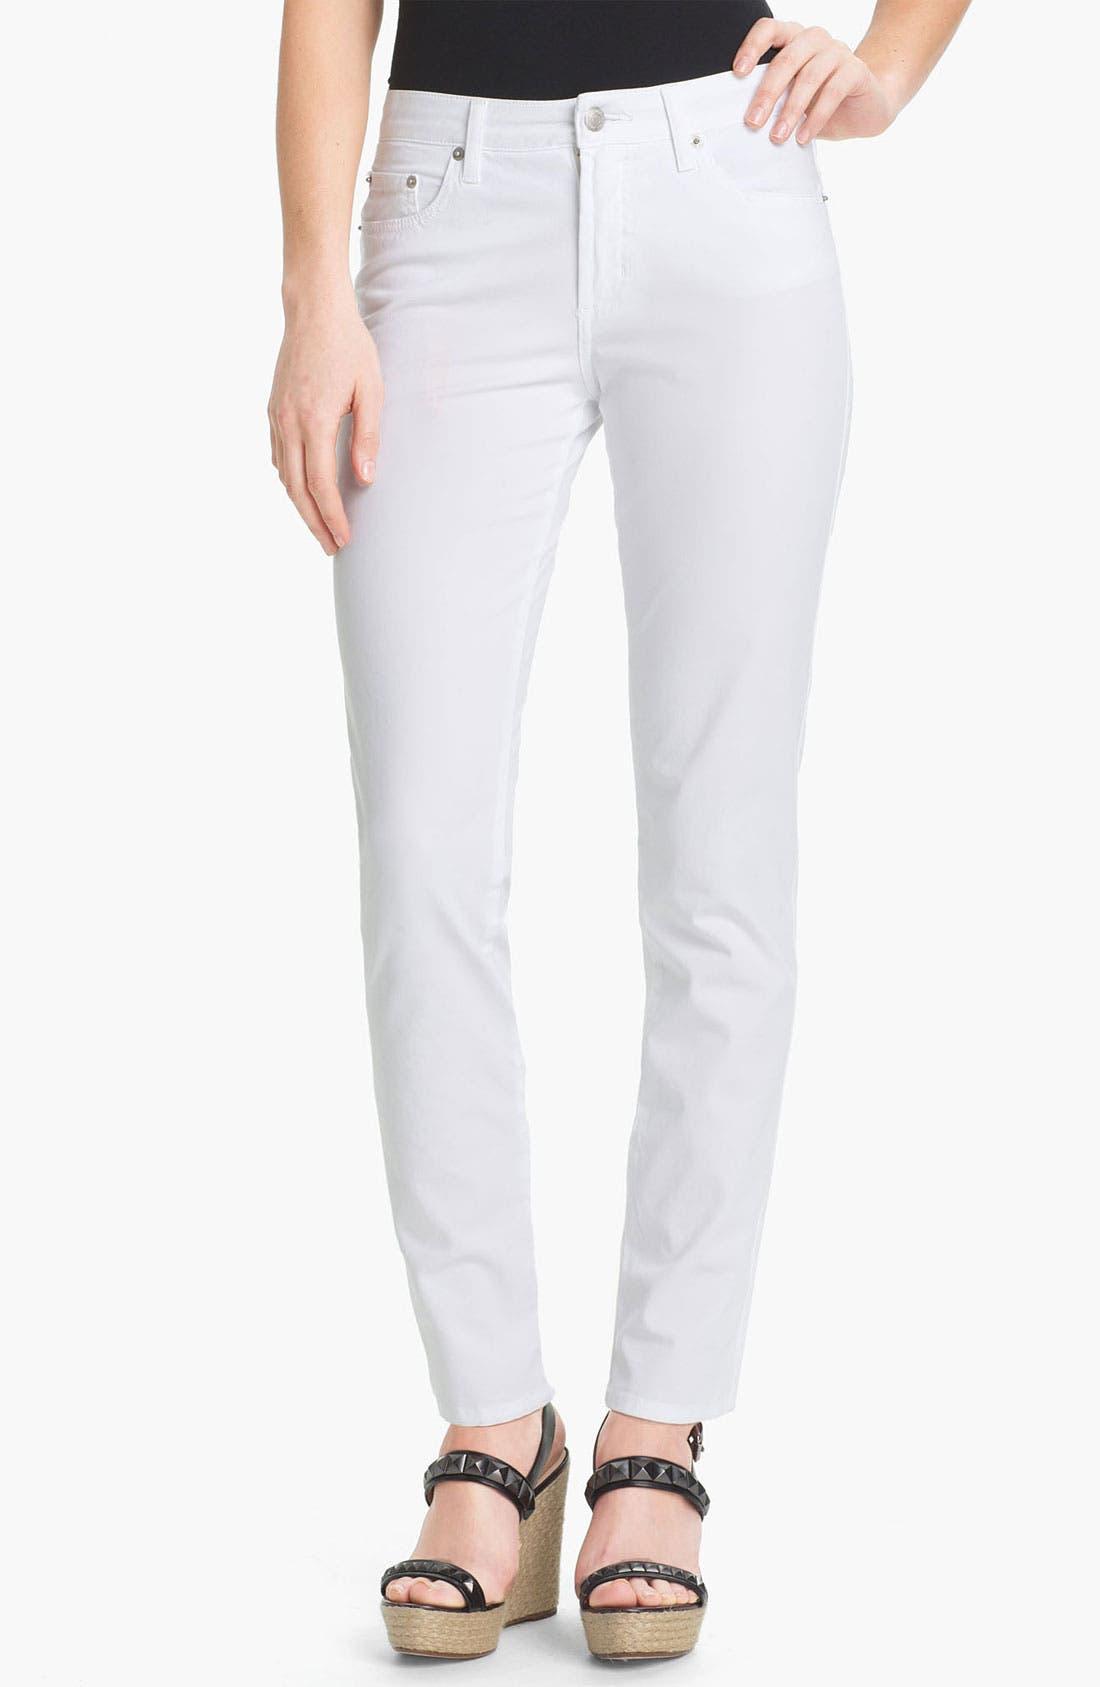 Main Image - Fabrizio Gianni 5-Pocket Slim Stretch Jeans (Online Only)